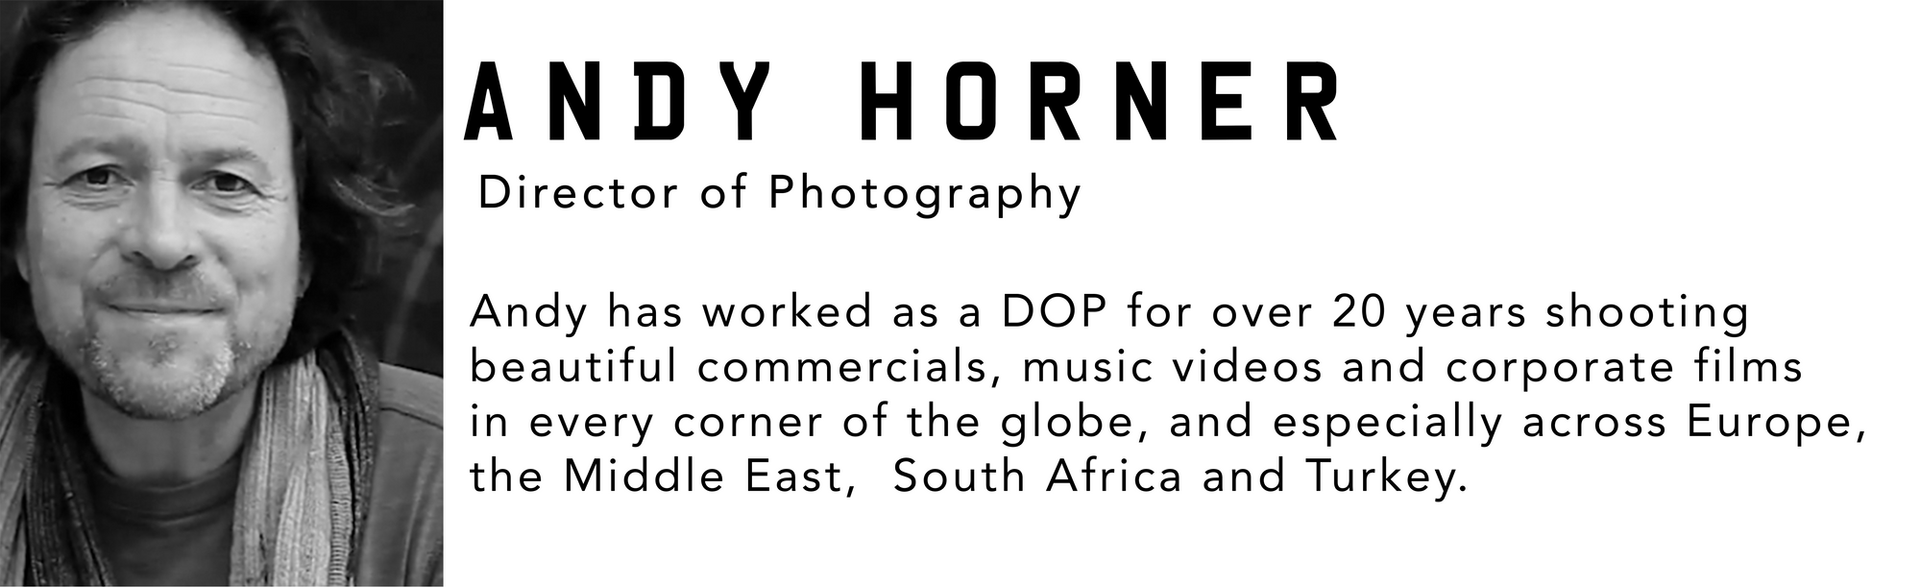 Andy Horner